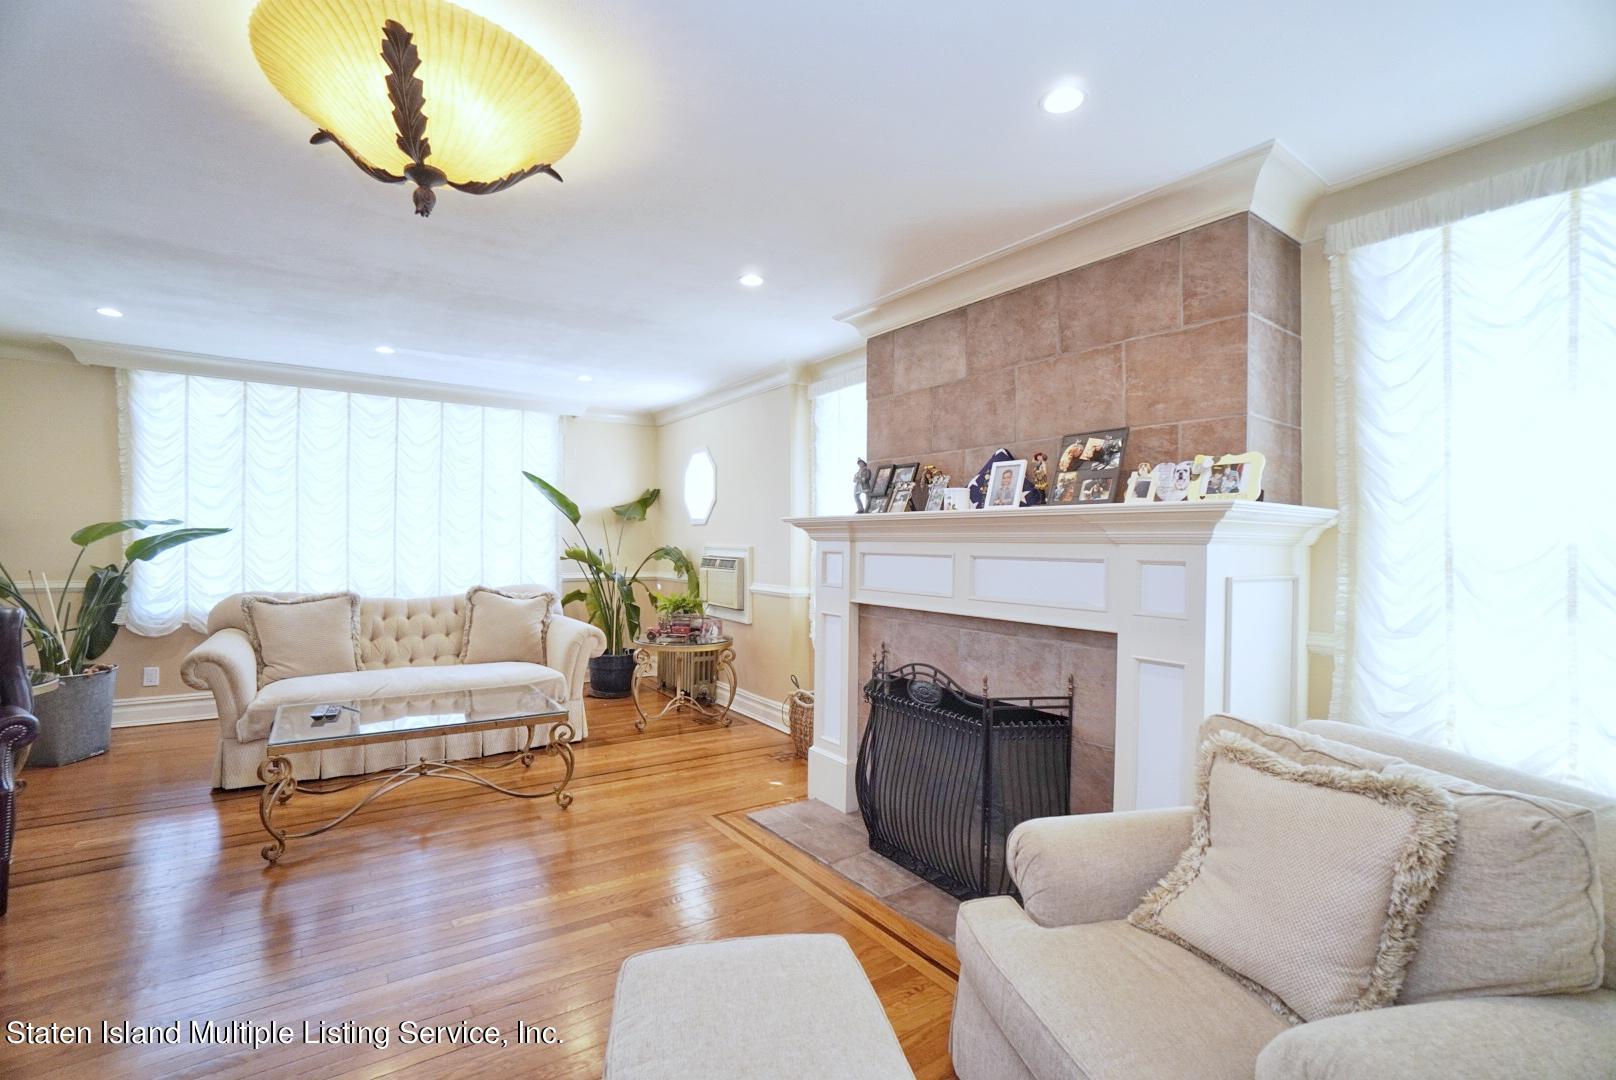 Single Family - Detached 264 Fisher Avenue  Staten Island, NY 10307, MLS-1146898-9